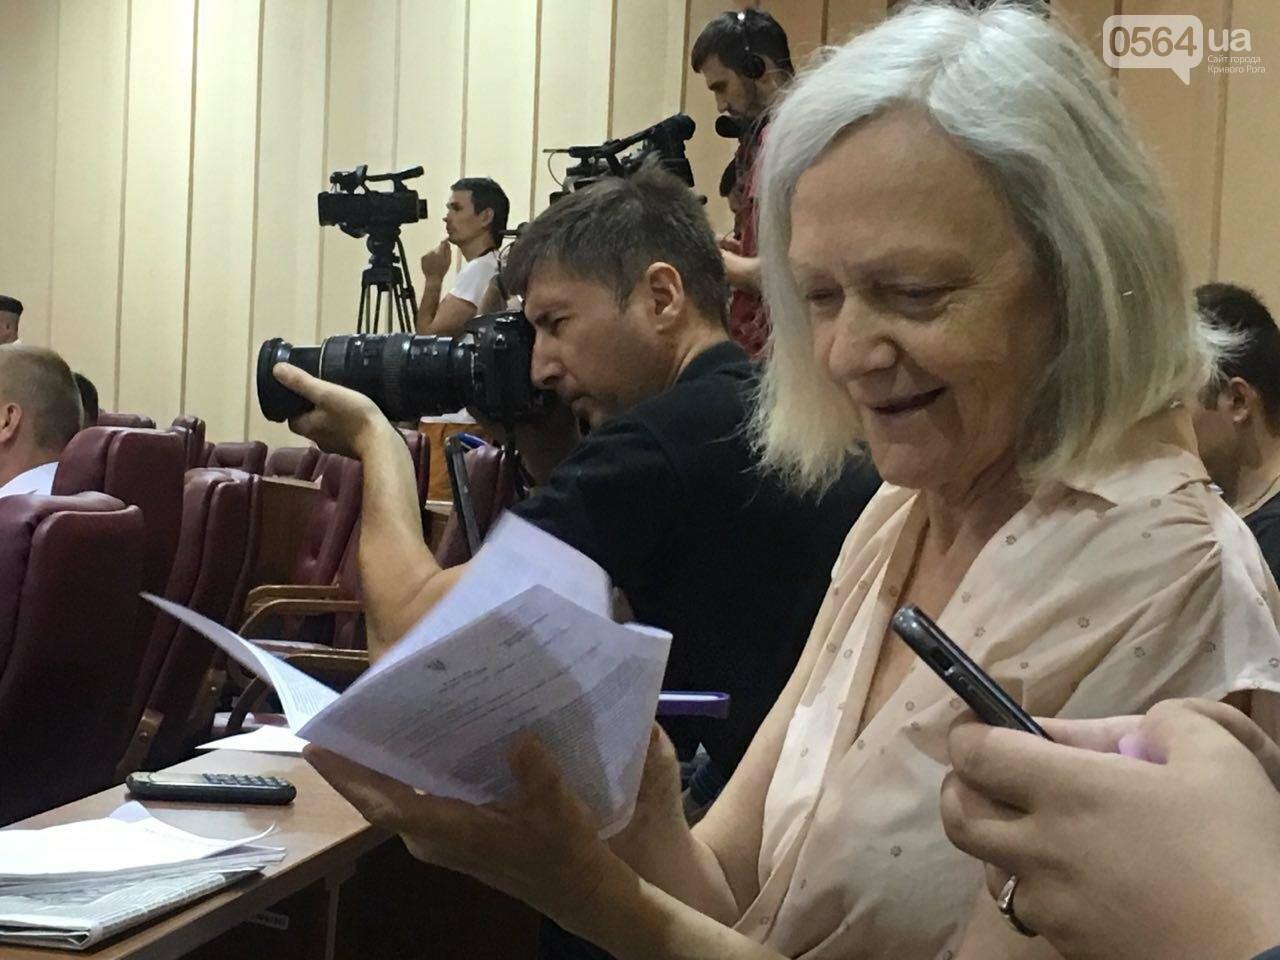 Криворожский горсовет не поддержал петицию о запрете Марша равенства, - ФОТО, фото-6